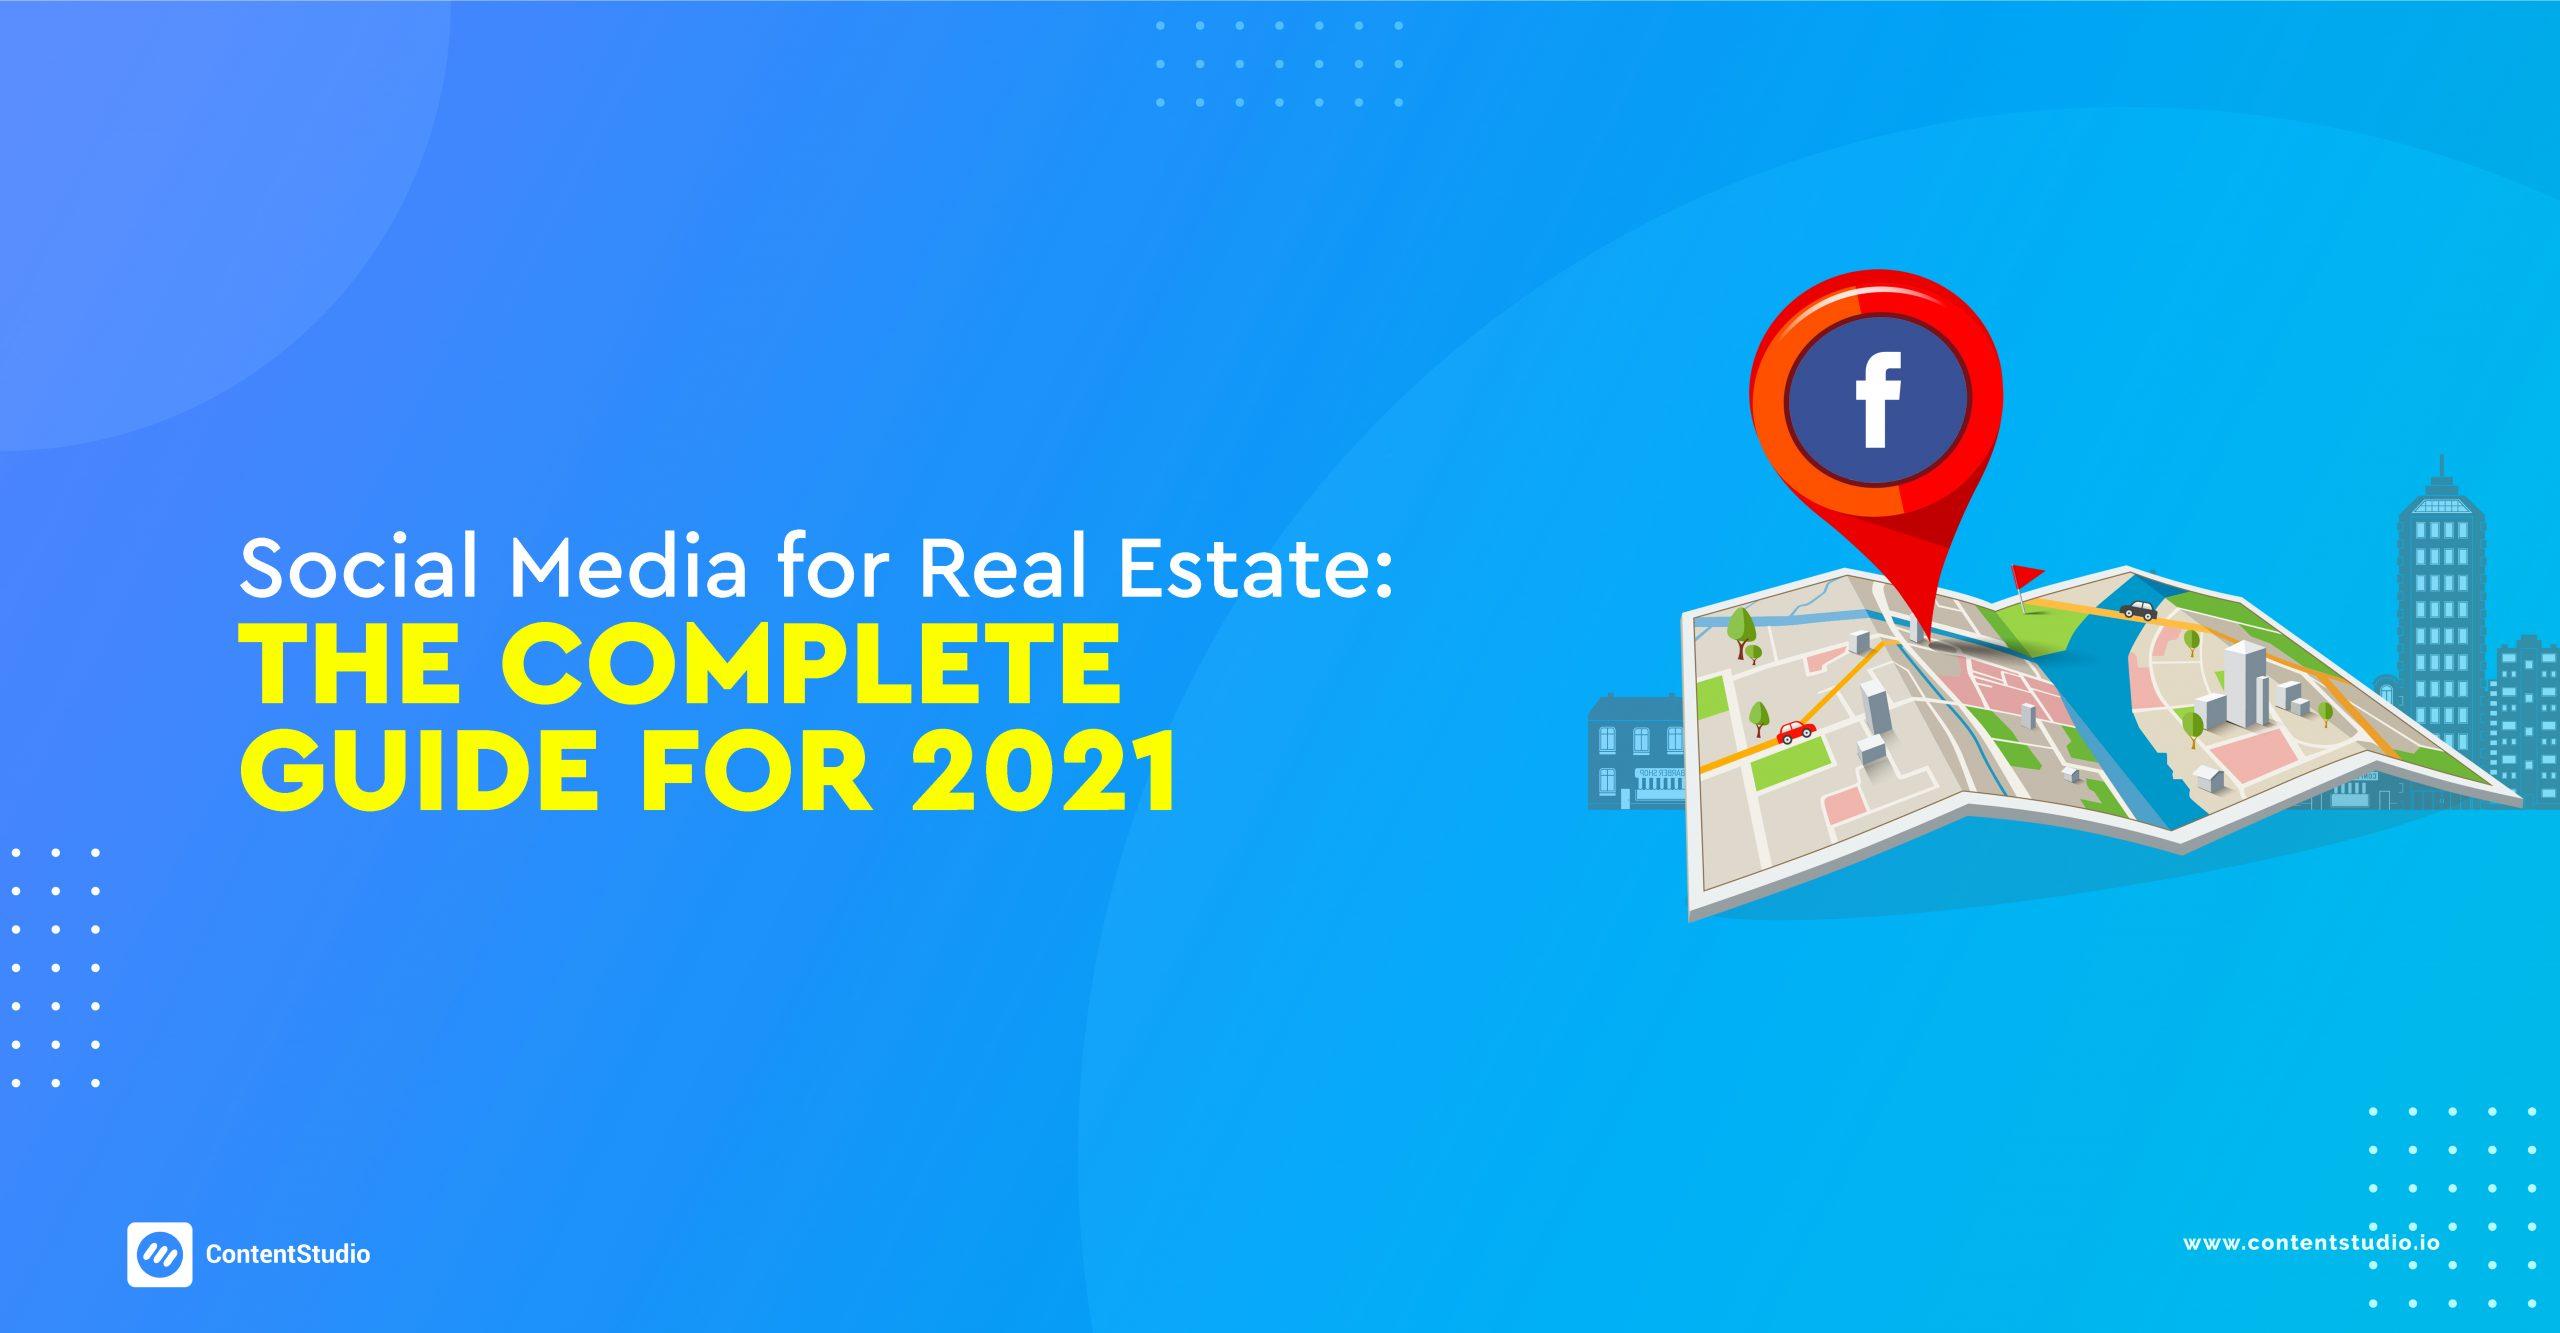 Social Media for Real Estate 2021